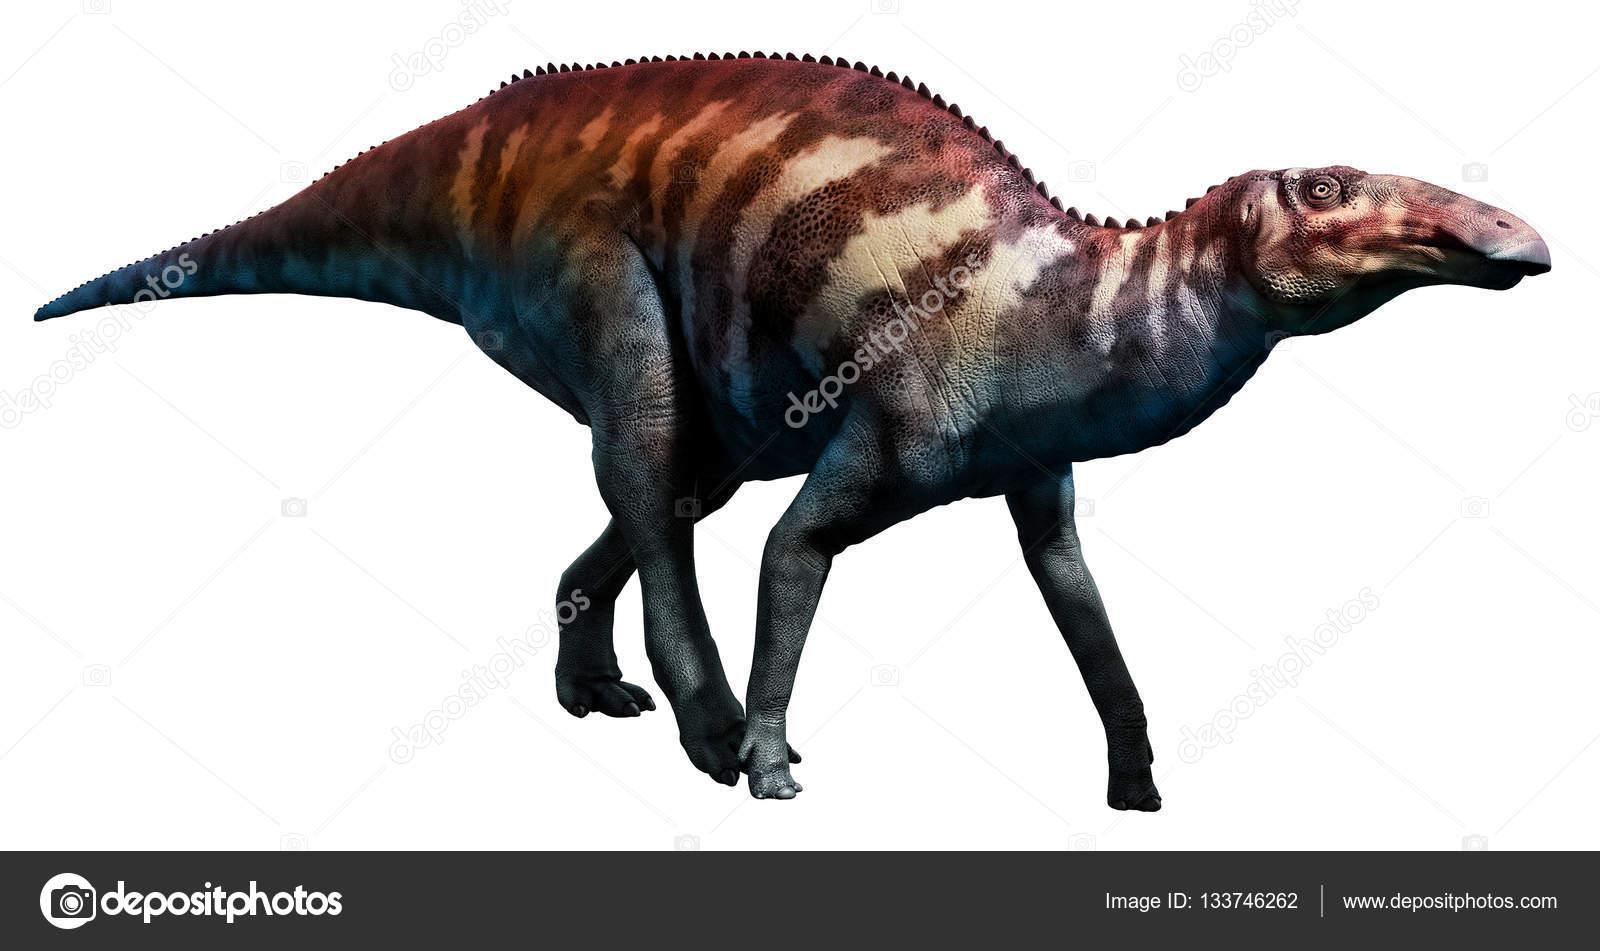 Эдмонтозавр, эдмонтозавр фото